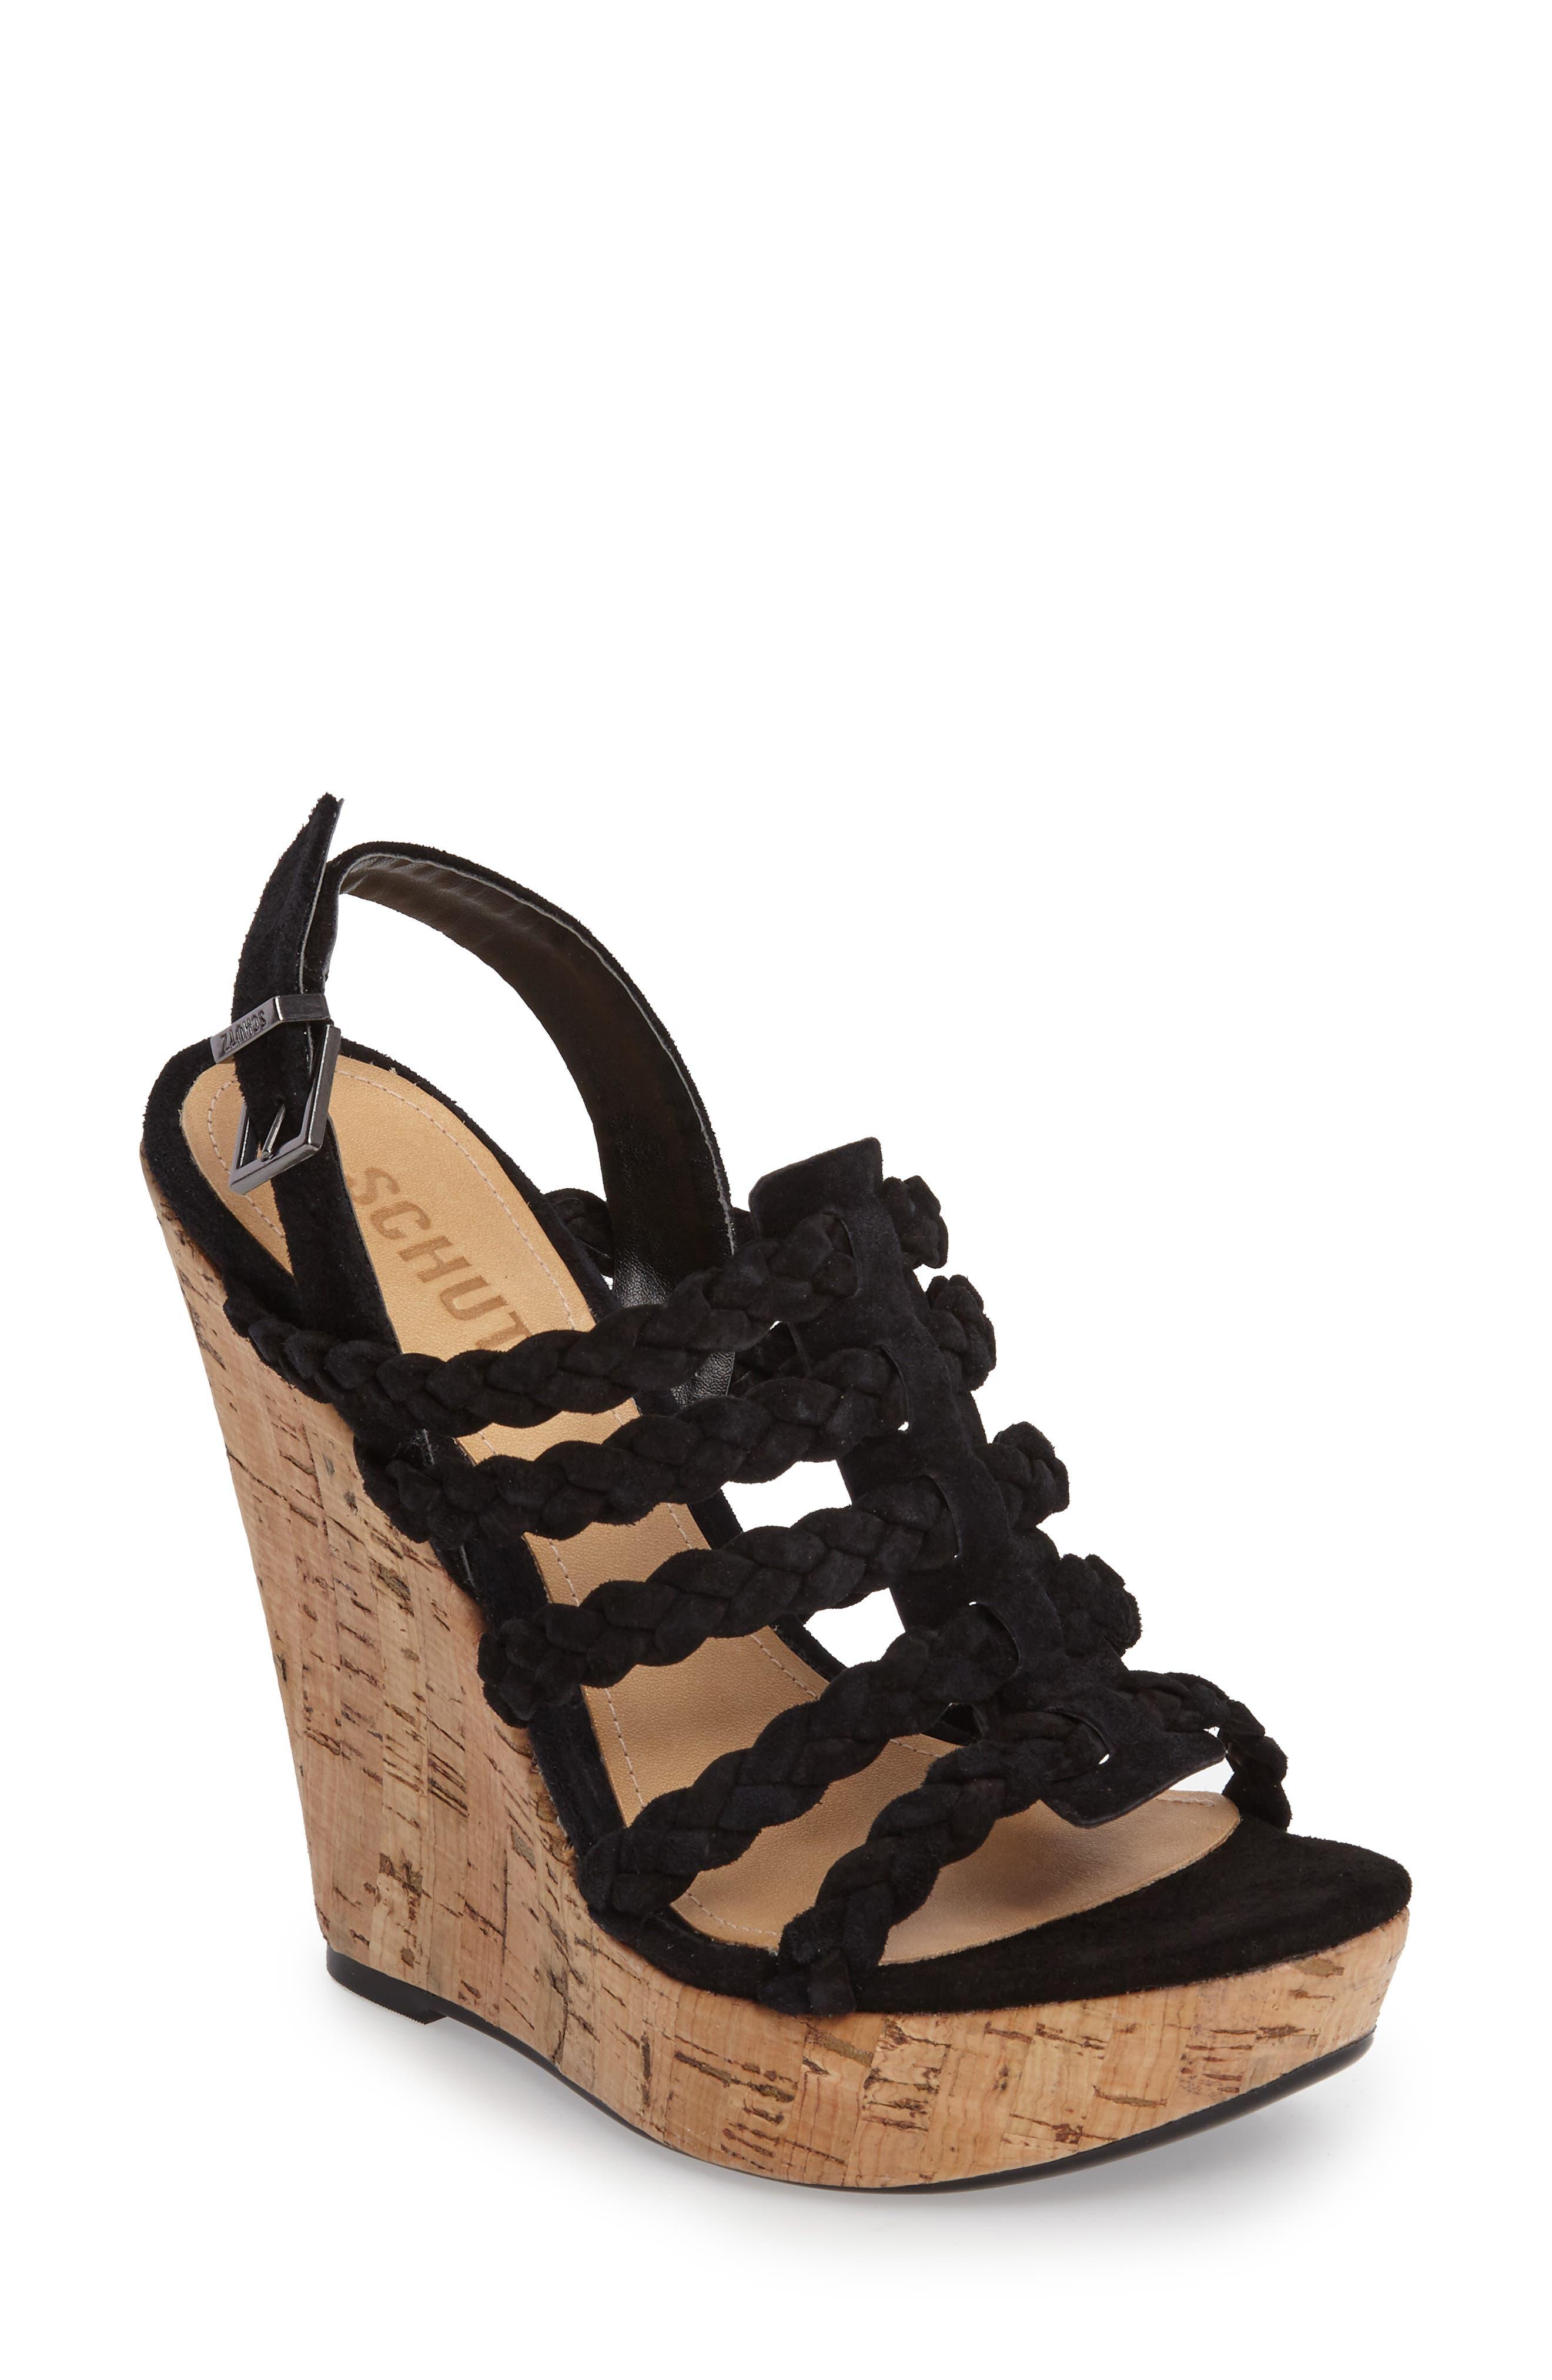 Main Image - Schutz Abigally Wedge Sandal (Women)